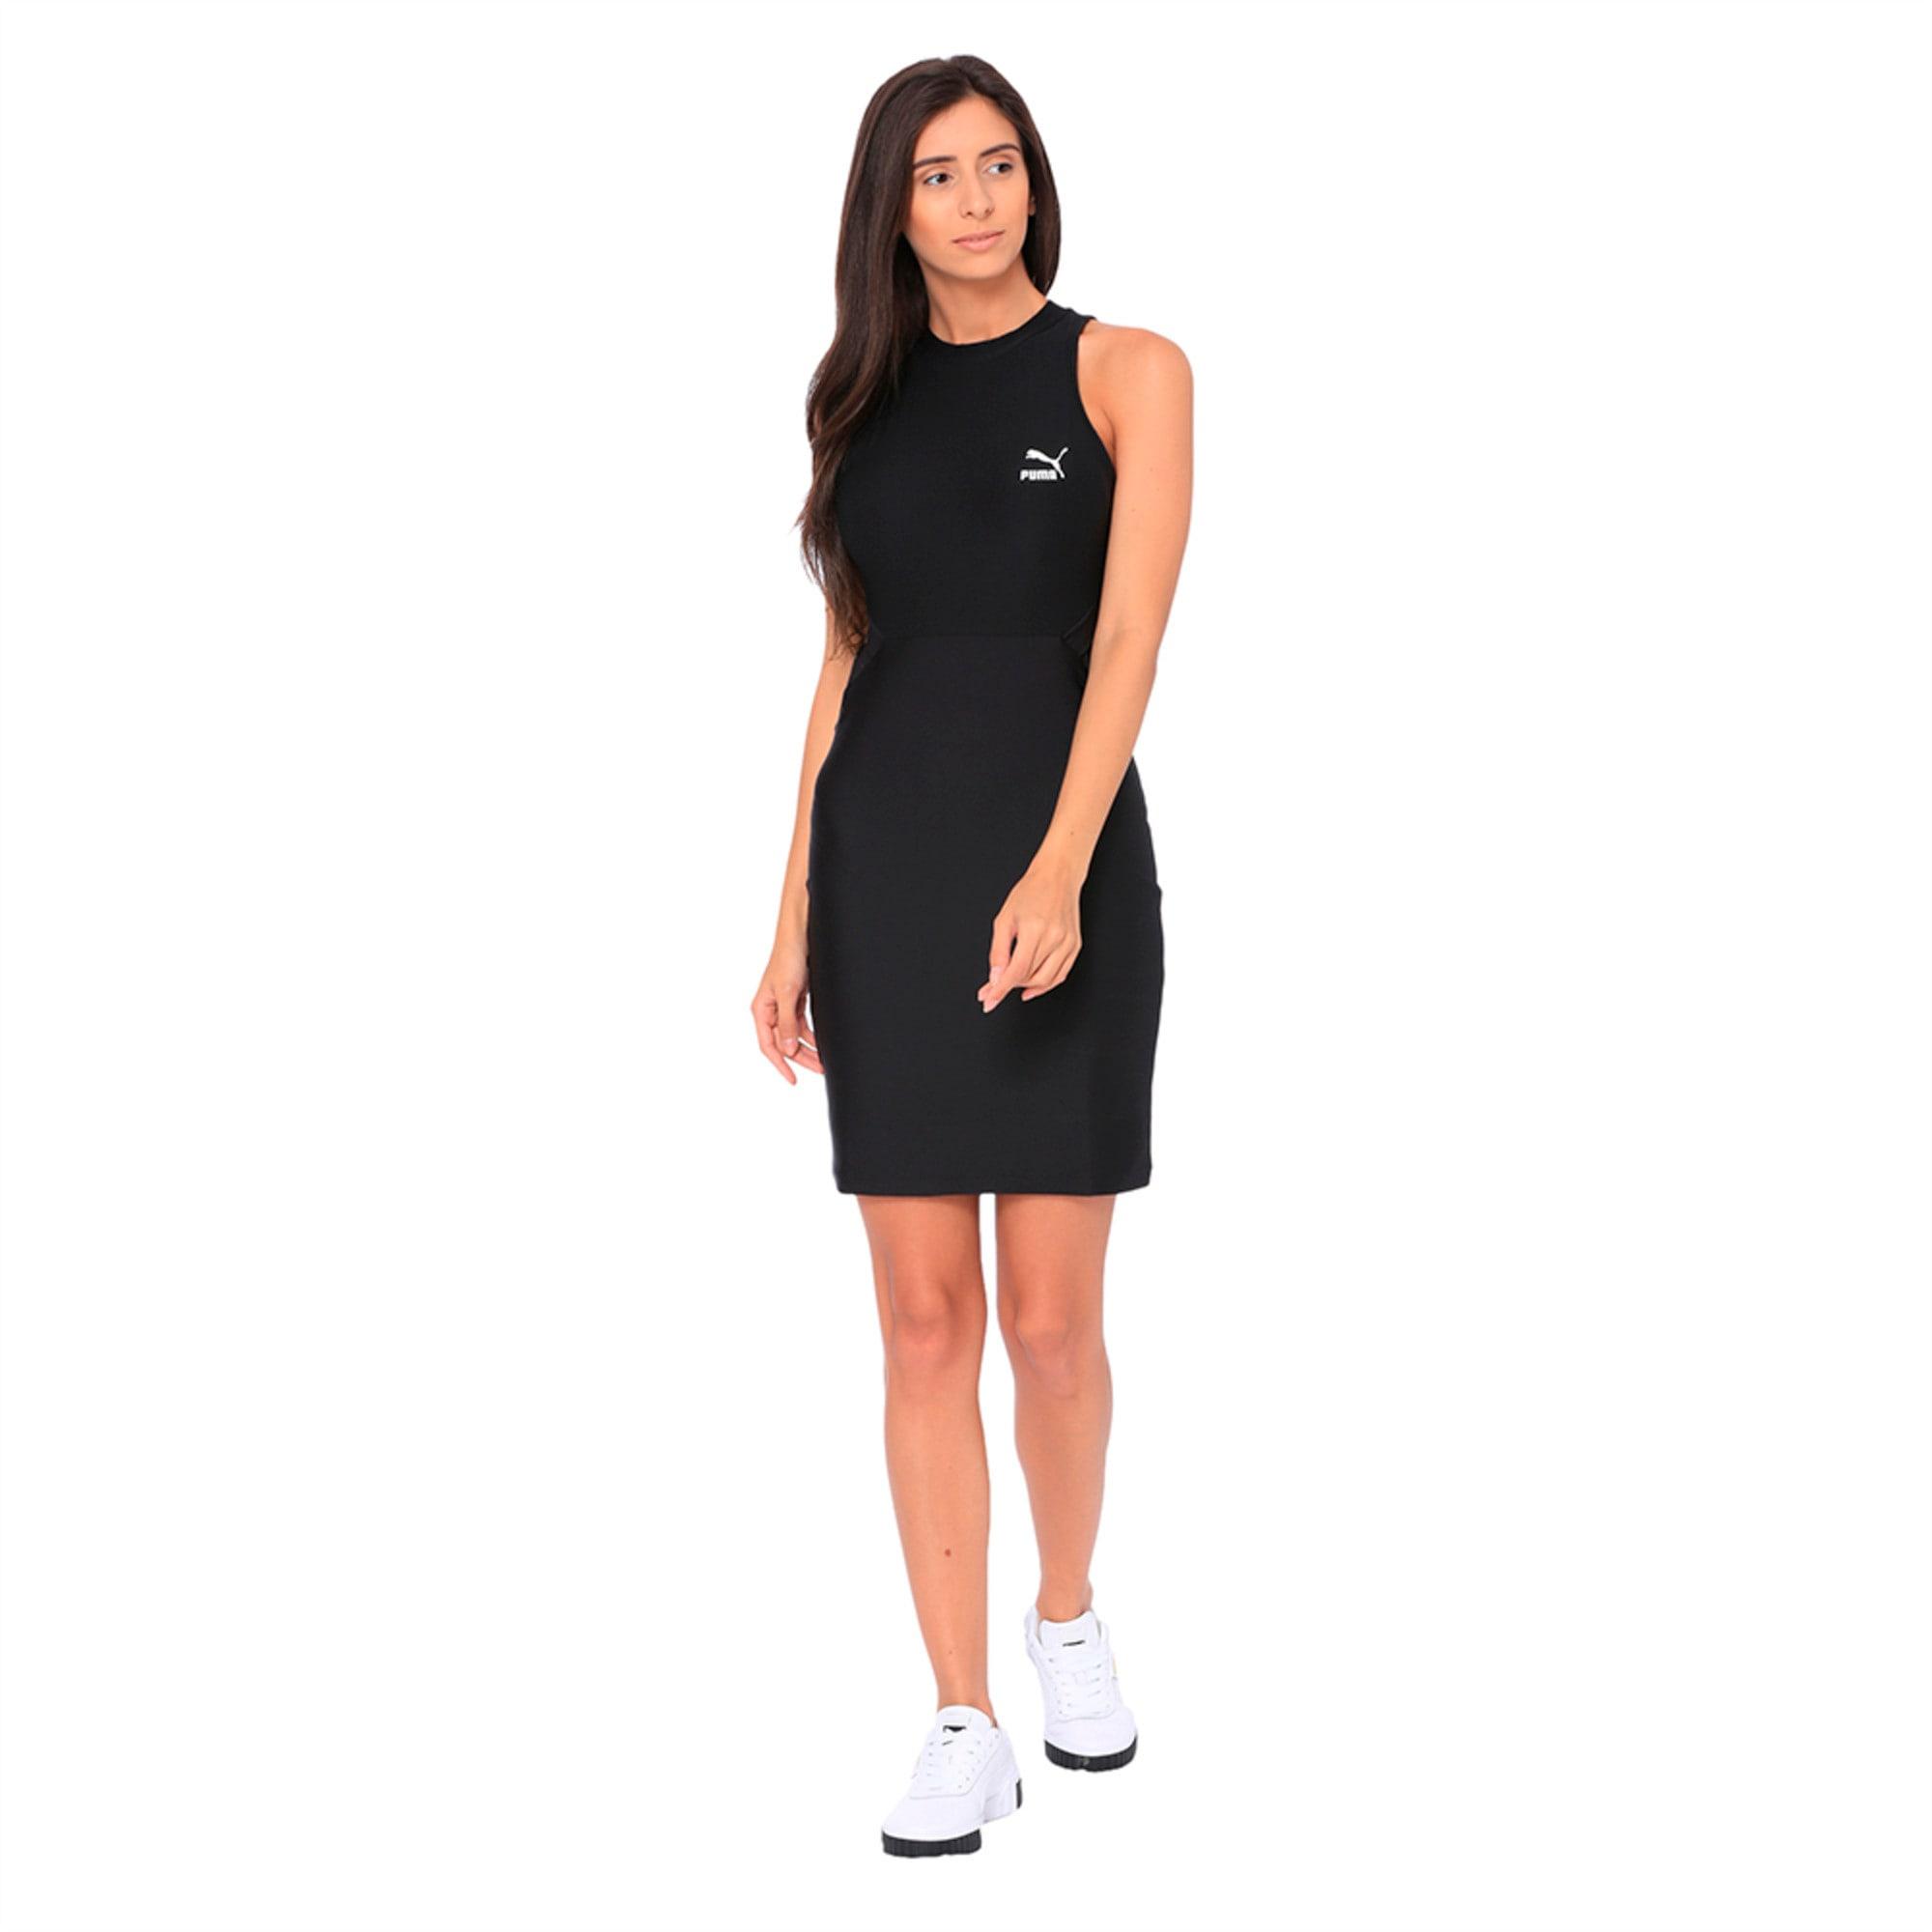 Classics Cut-Out Women's Dress   Puma Black   PUMA Dresses & Skirts   PUMA